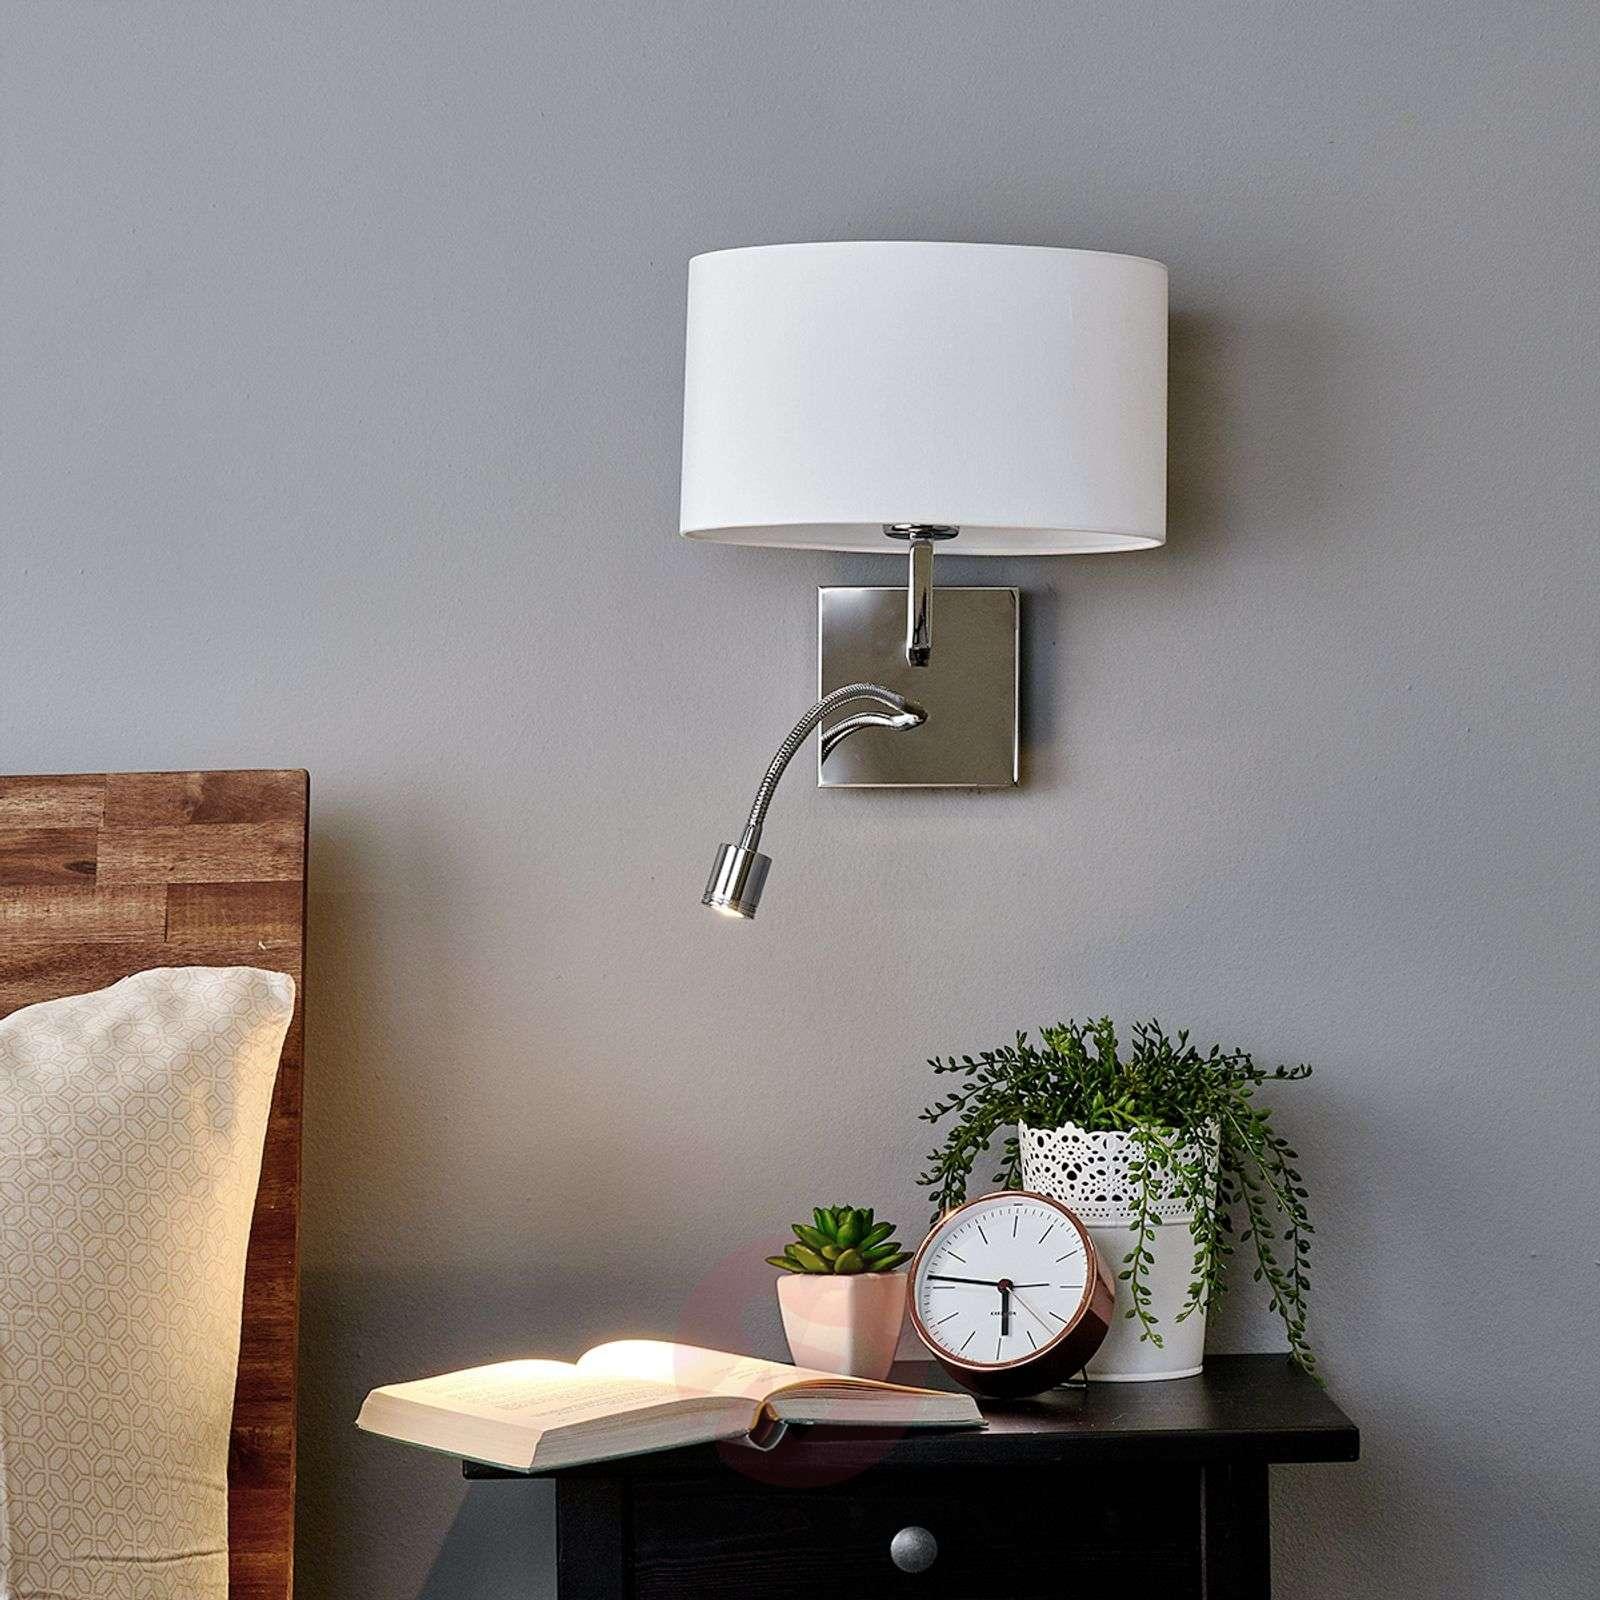 White fabric wall light Karla, LED reading light-9976009-01